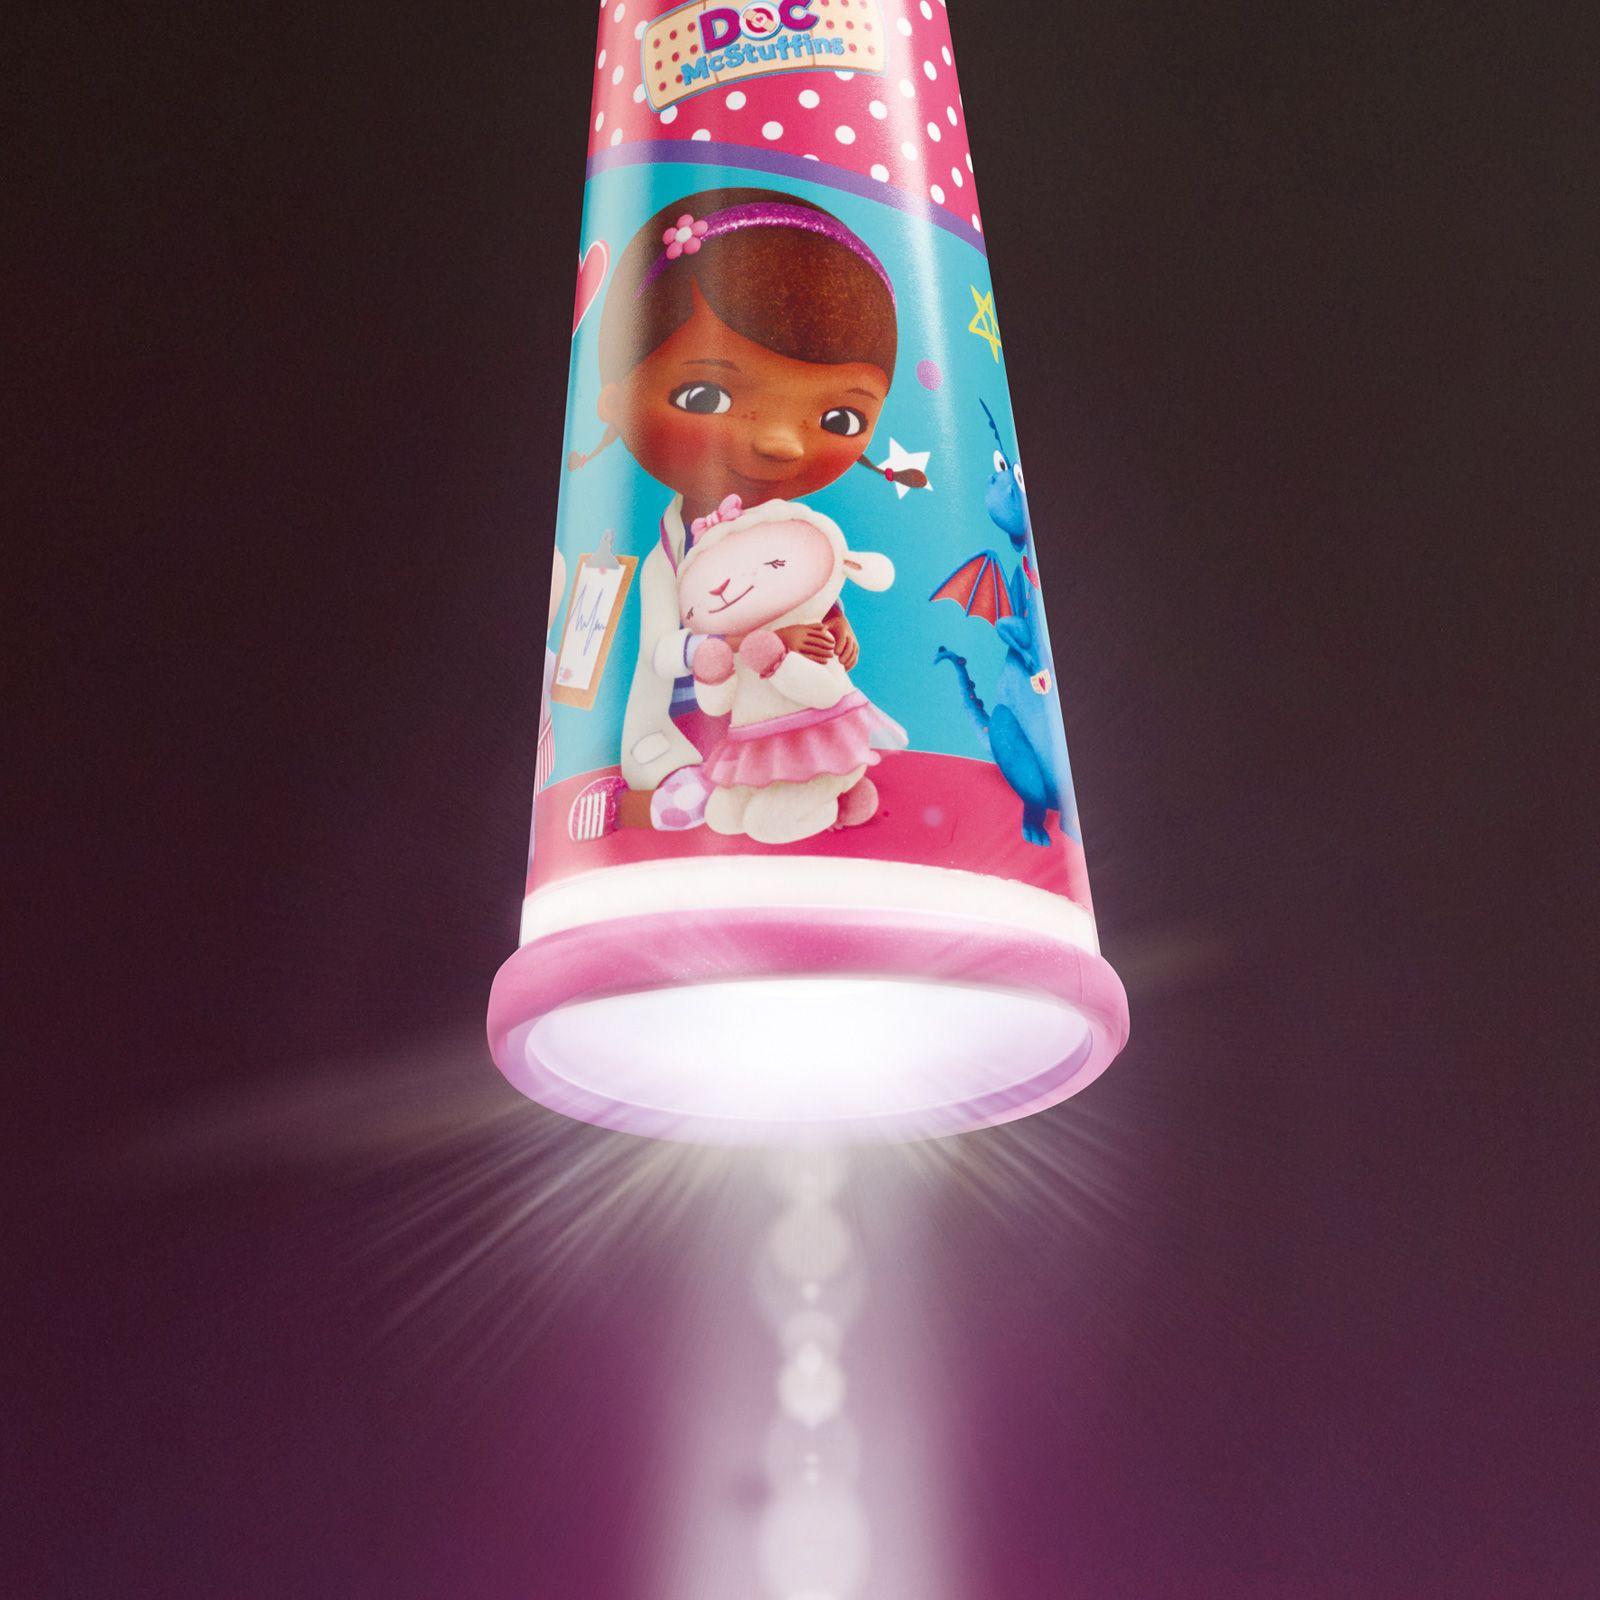 Indexbild 2 - GO GLOW NIGHT BEAM TILT TORCH LIGHTING LIGHT KIDS BEDROOM